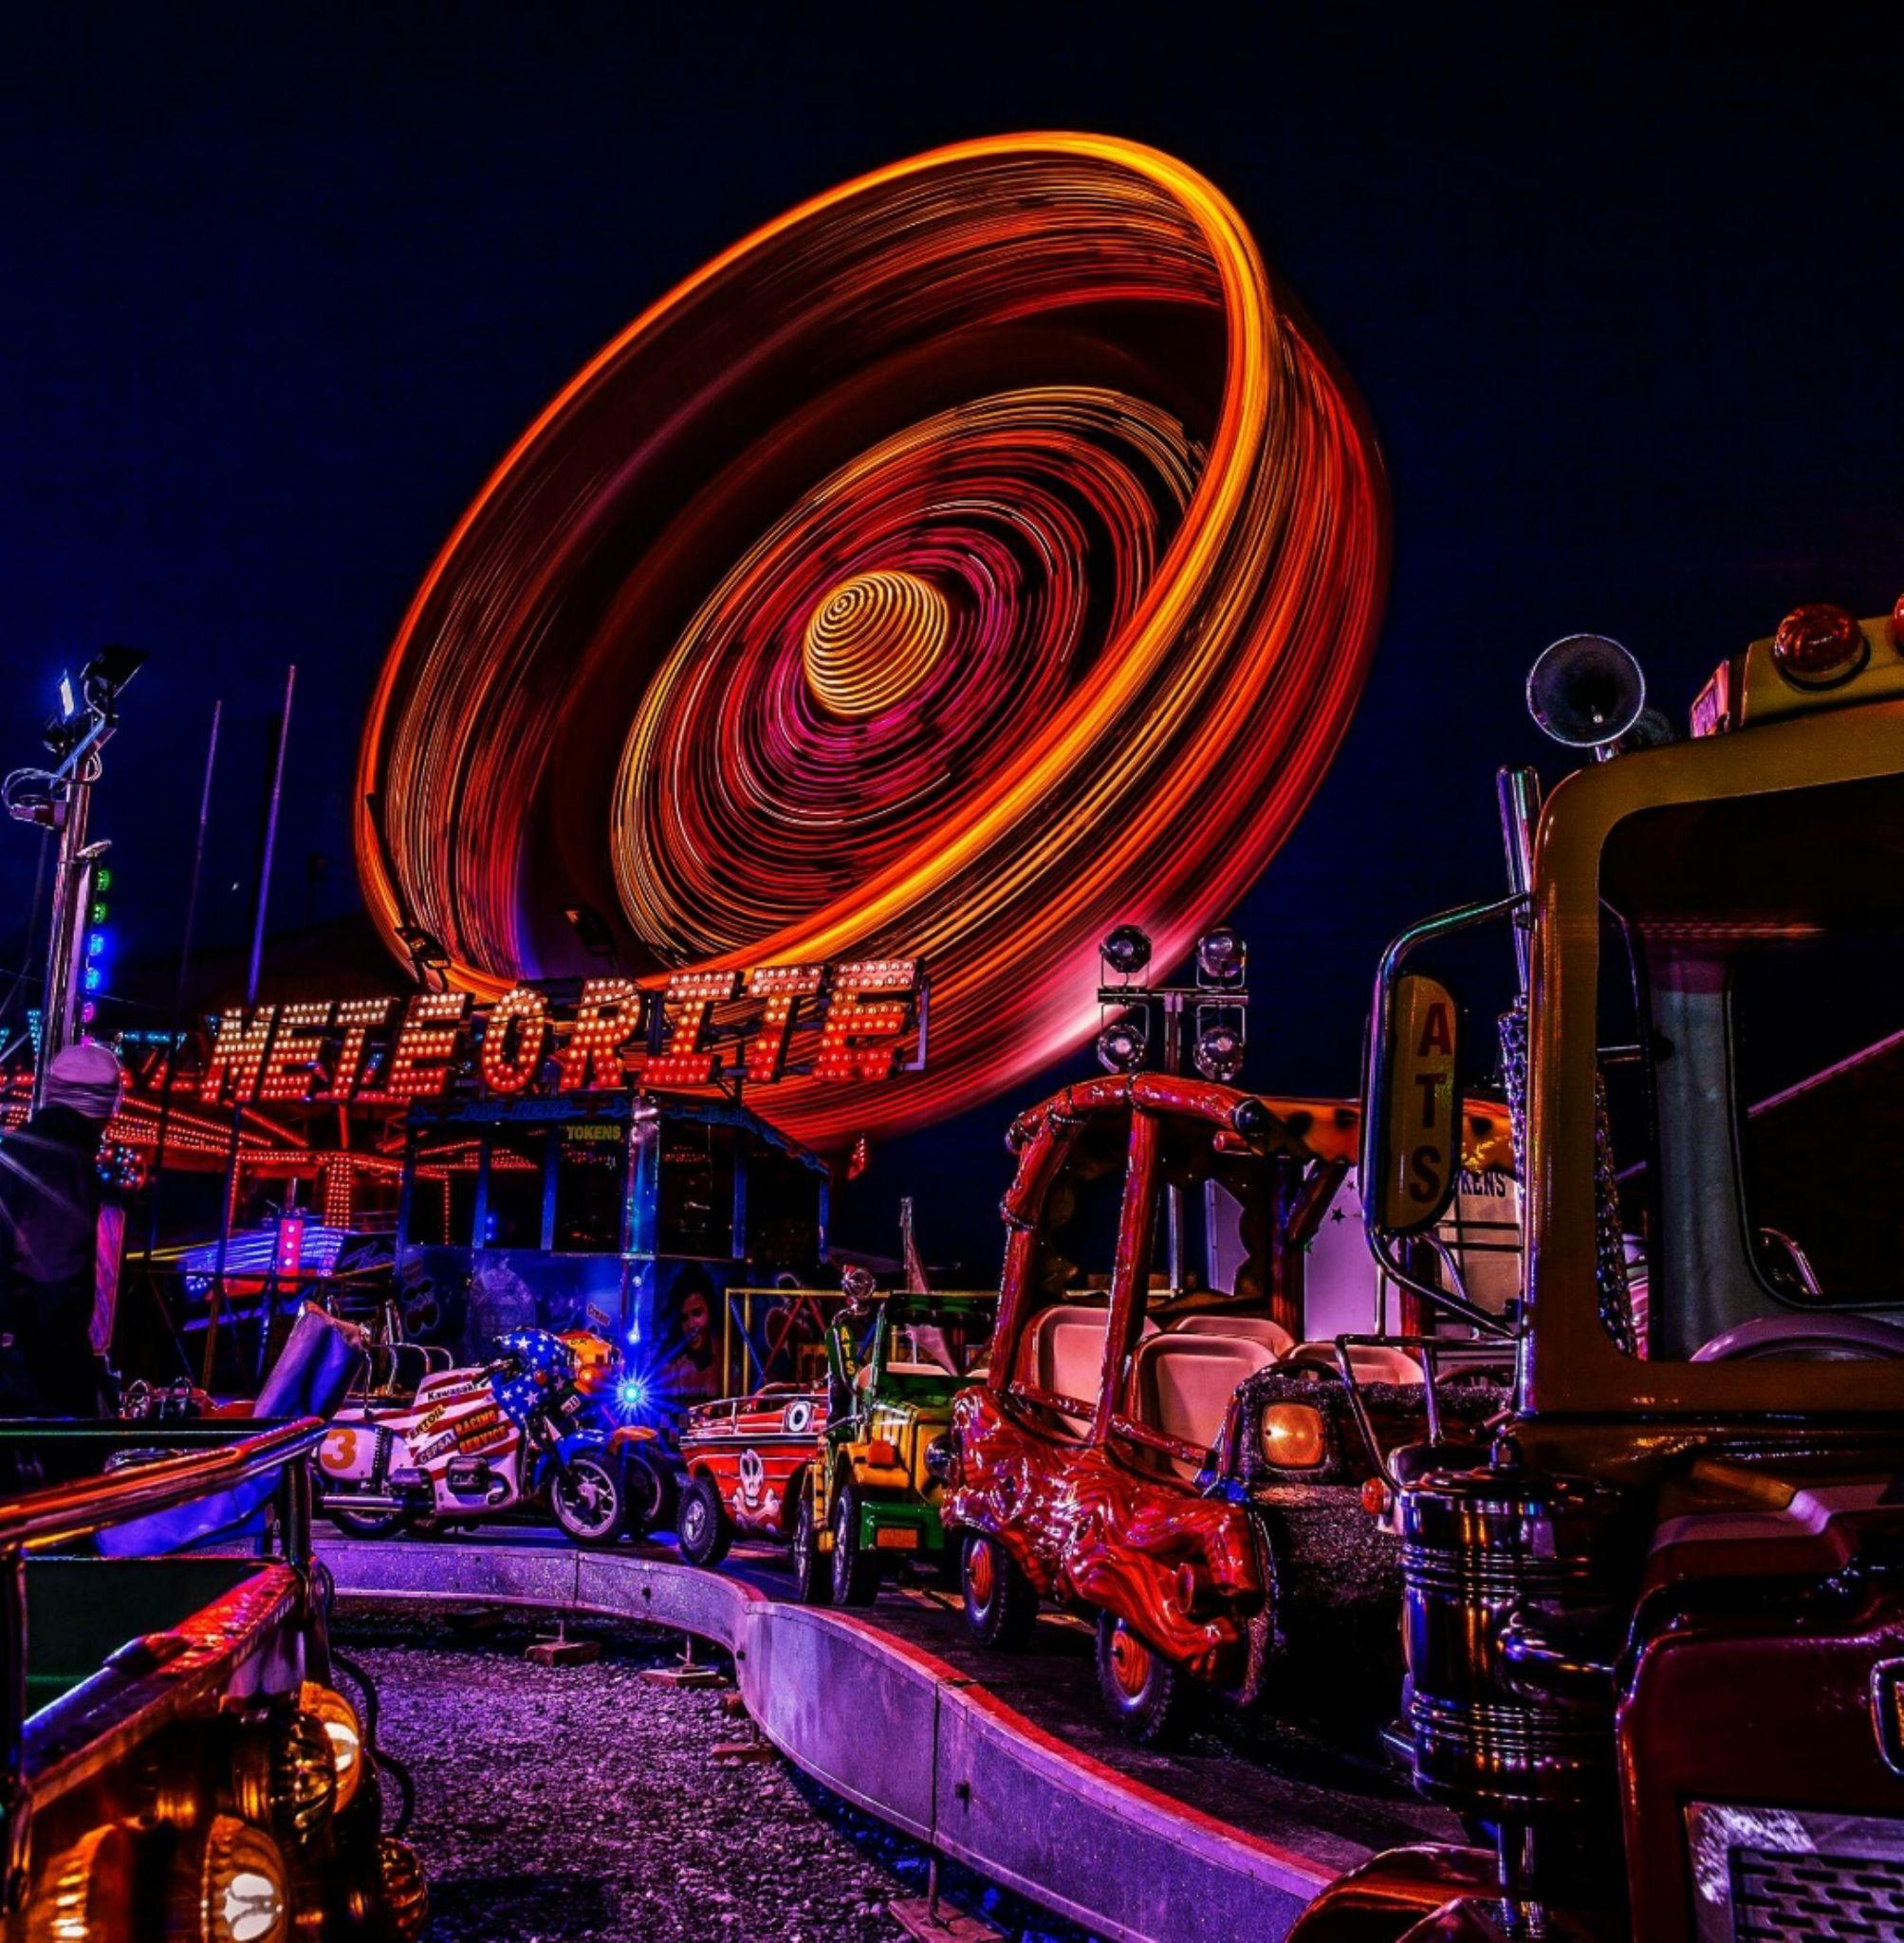 The Fun Fair  by BALRATH PHOTOGRAPHY